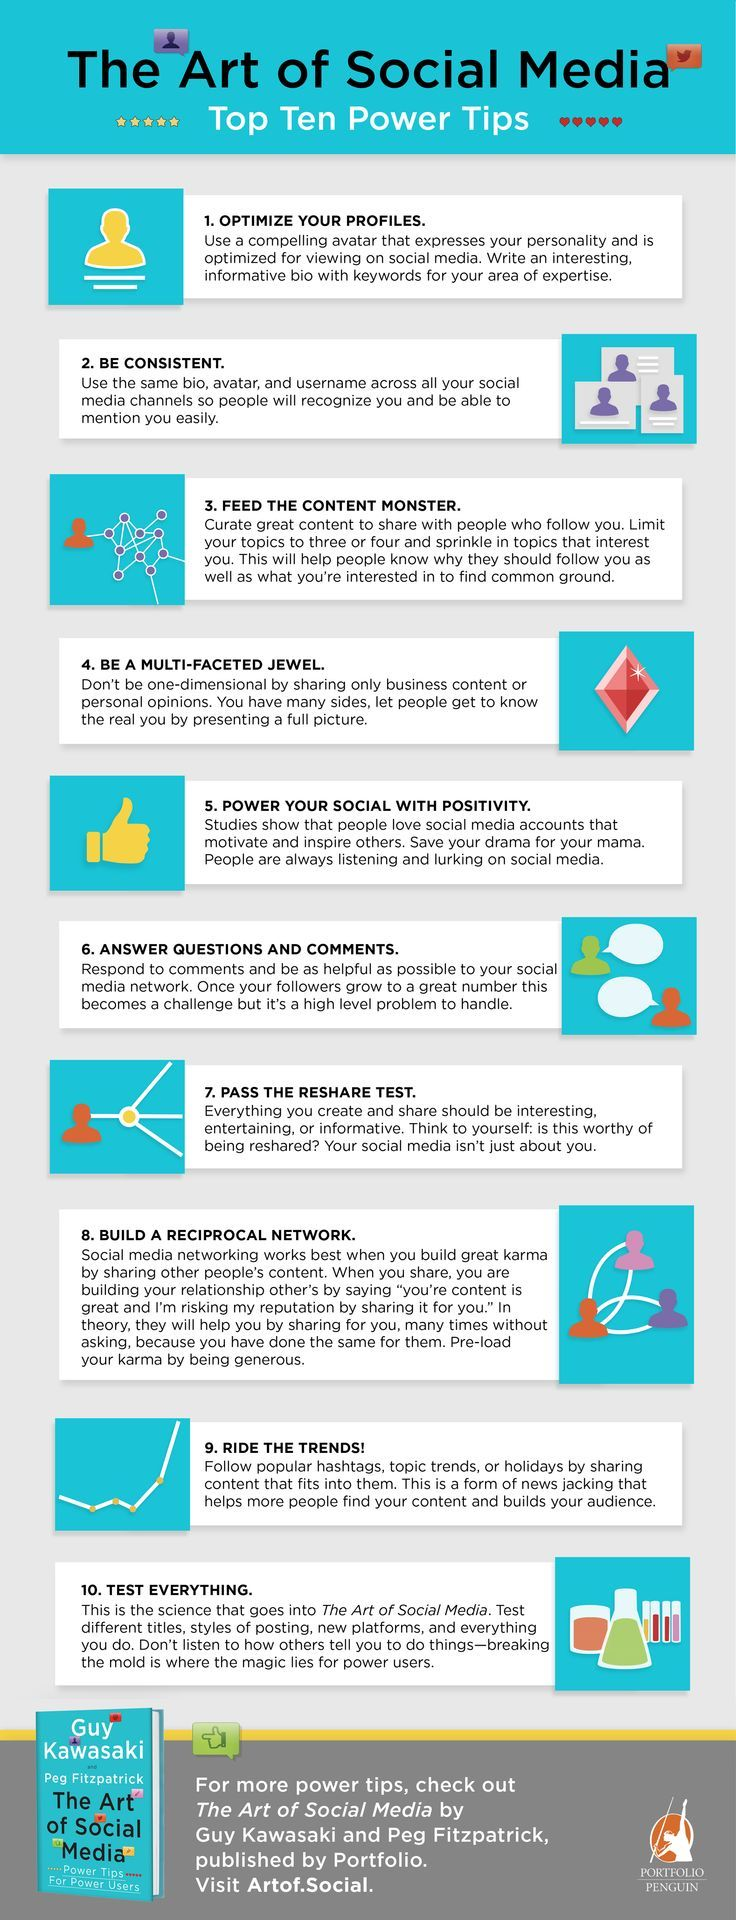 10 Social Media Power Tips You Can Use to Grow Your Business Right Now #socialMedia #médiasSociaux